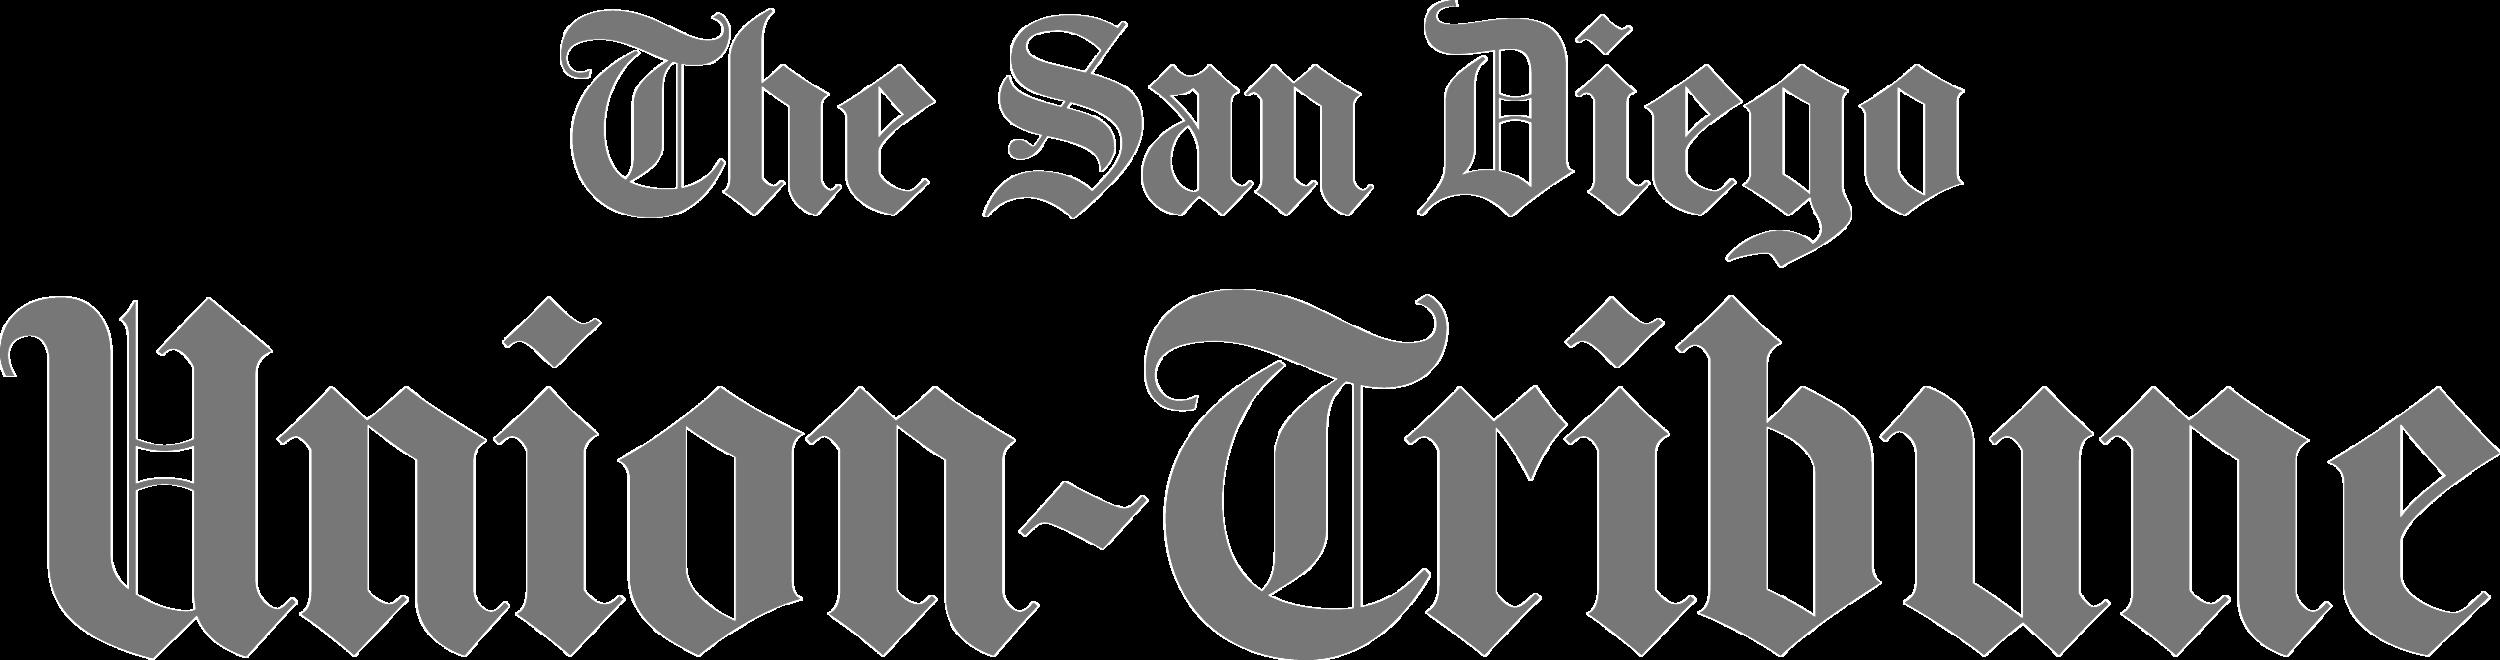 San Diego Union Tribune copy.png